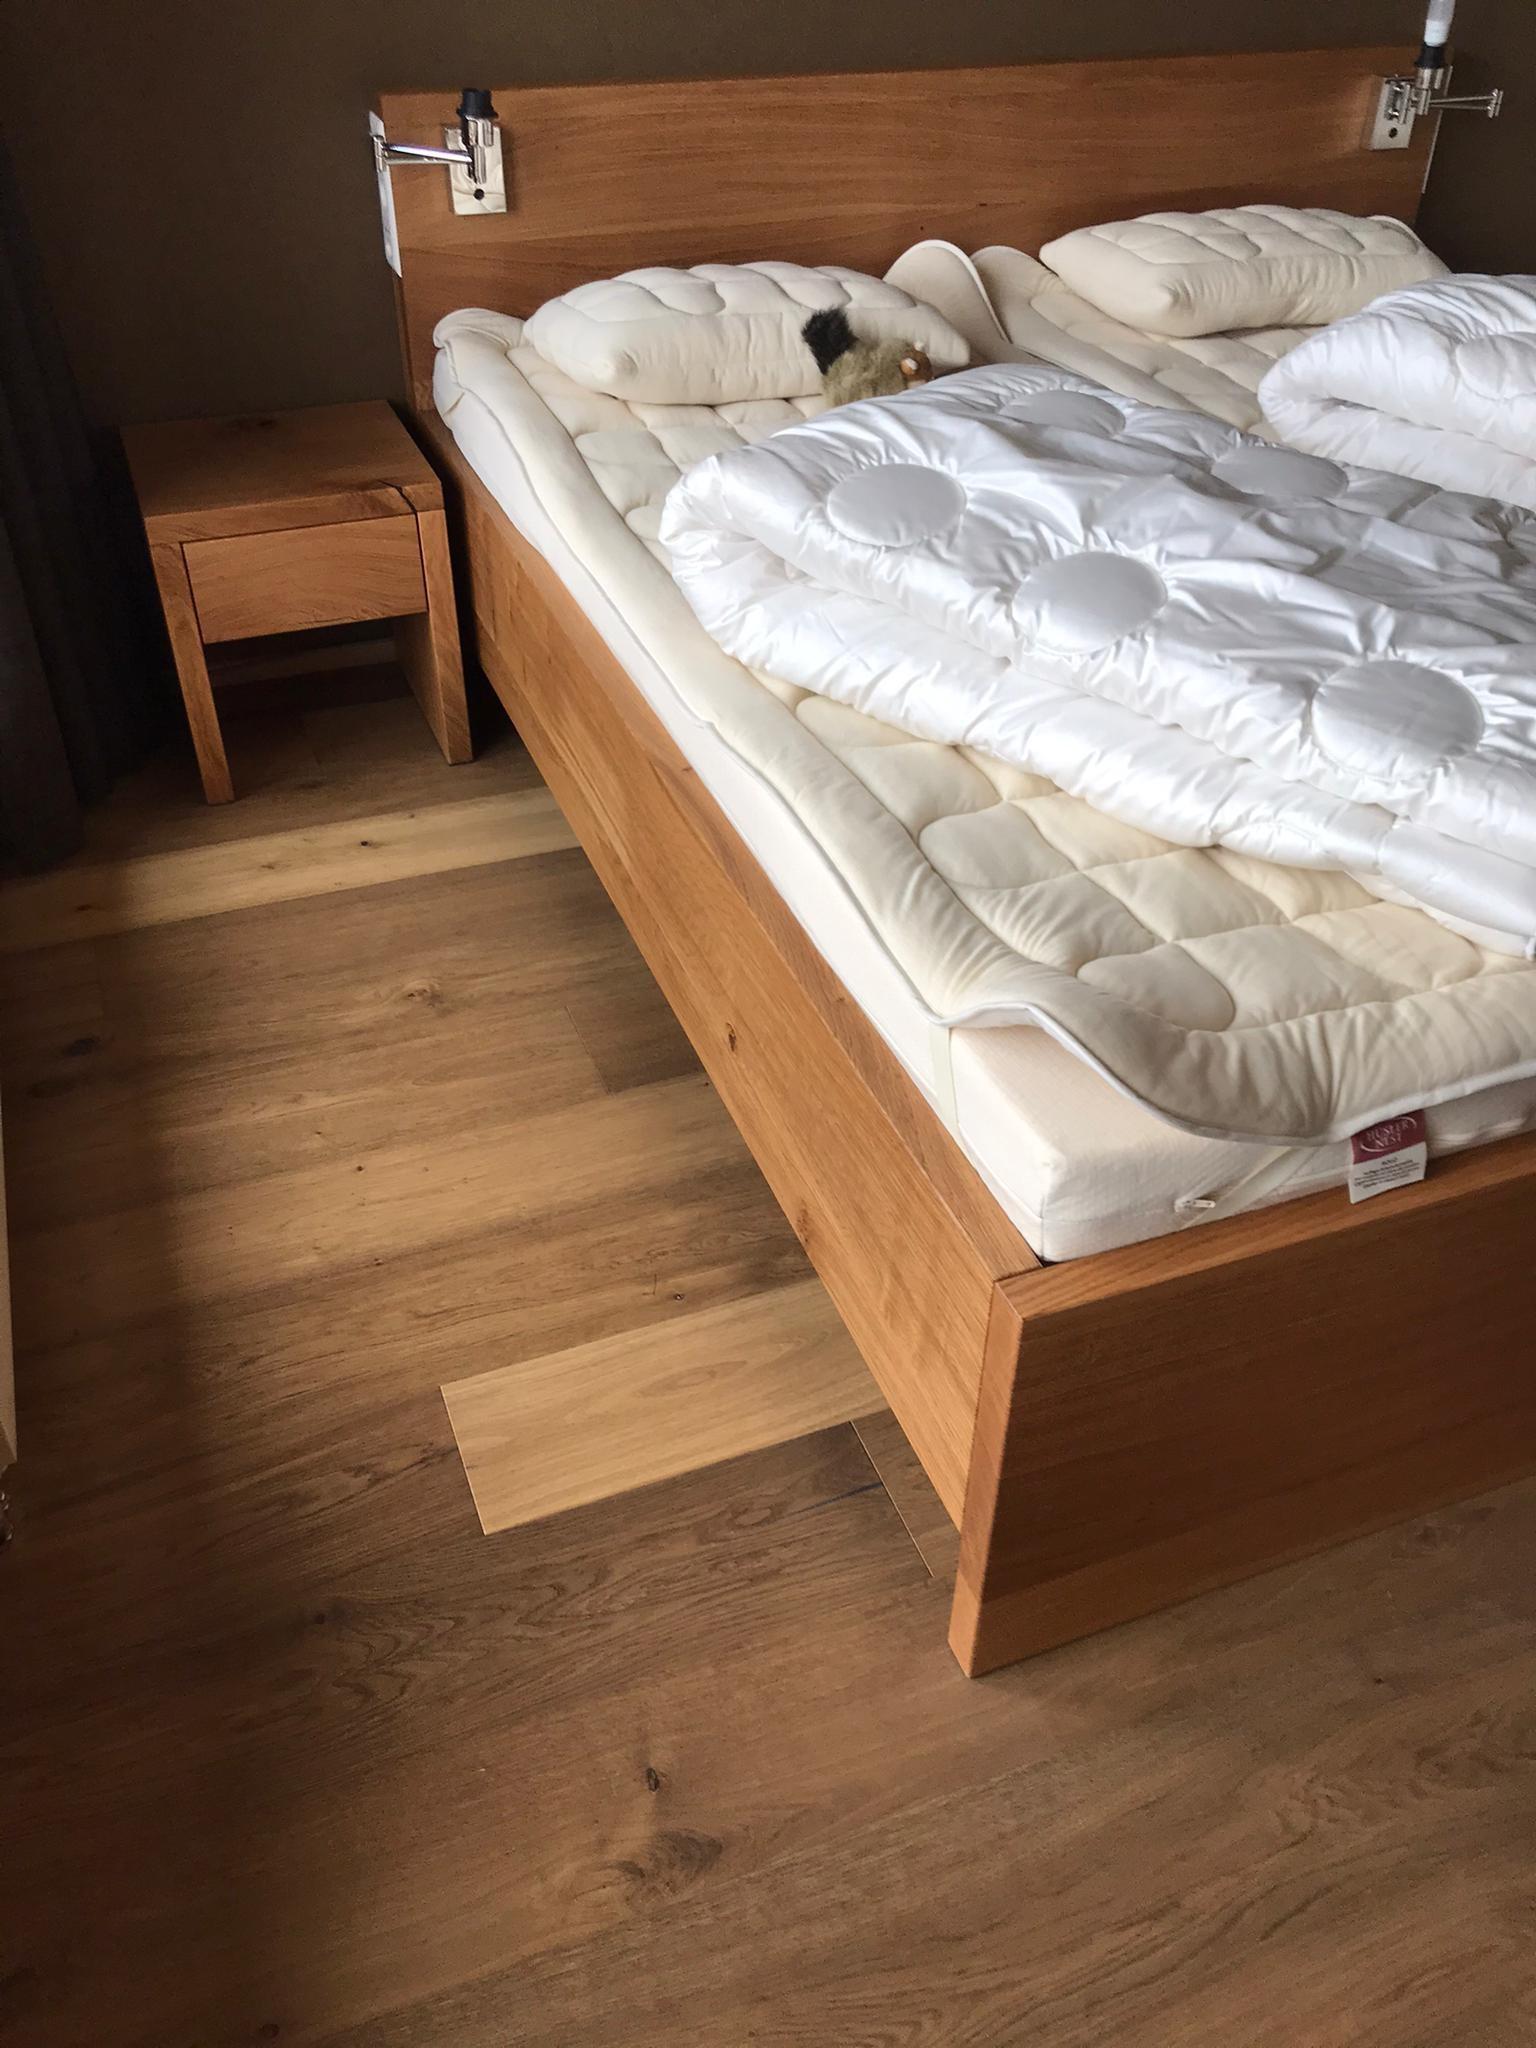 Eichen Bett, rustikal. Alle Verbindungen ohne Metall!